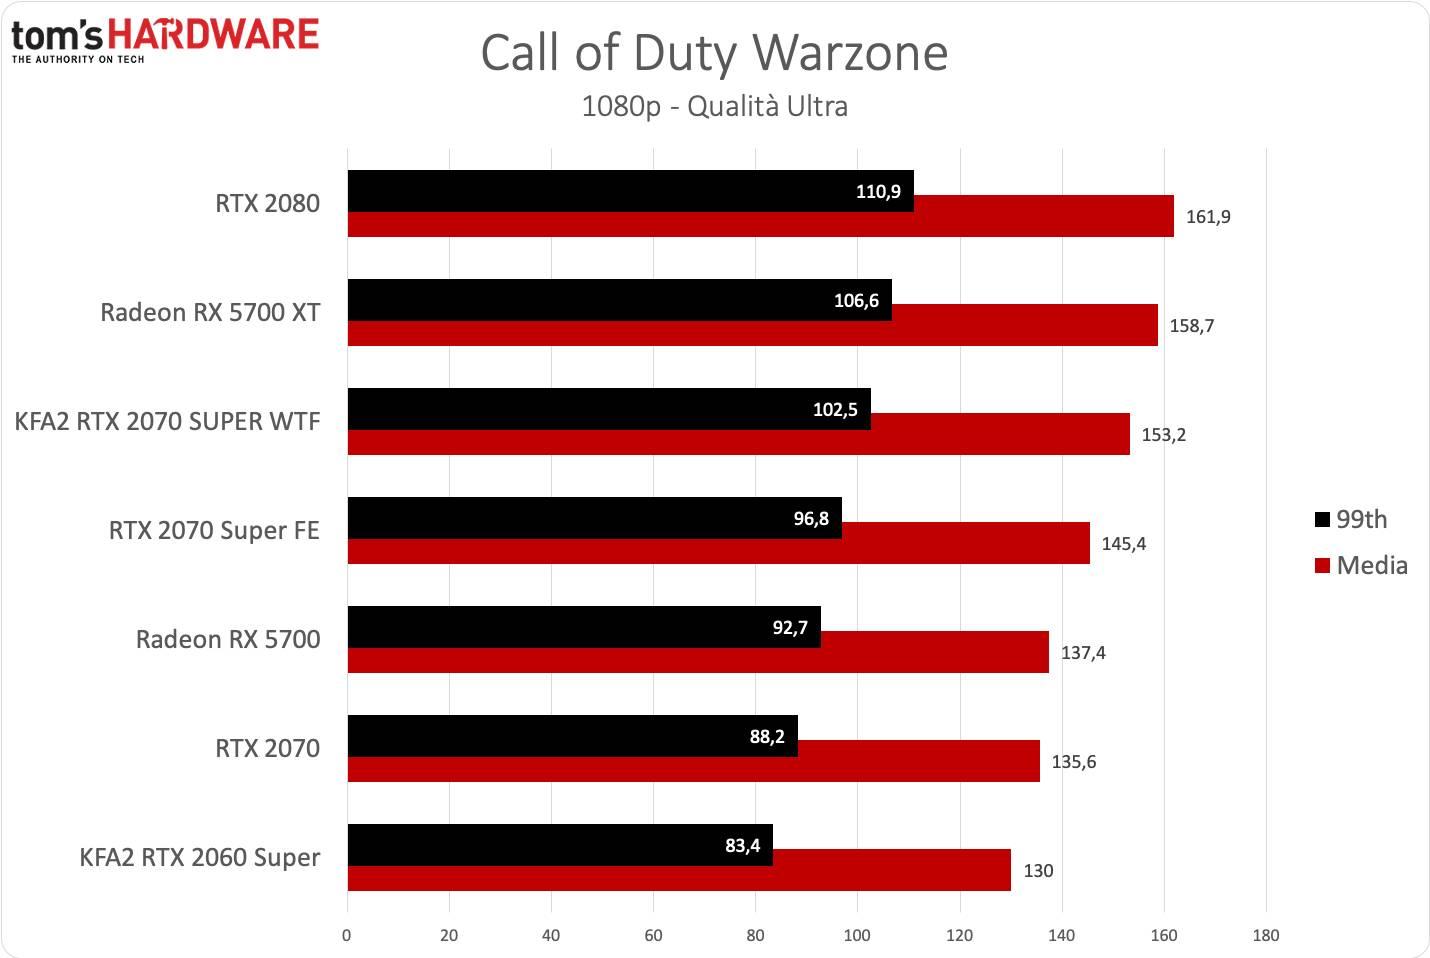 KFA2 RTX 2070 SUPER WTF - Warzone FHD